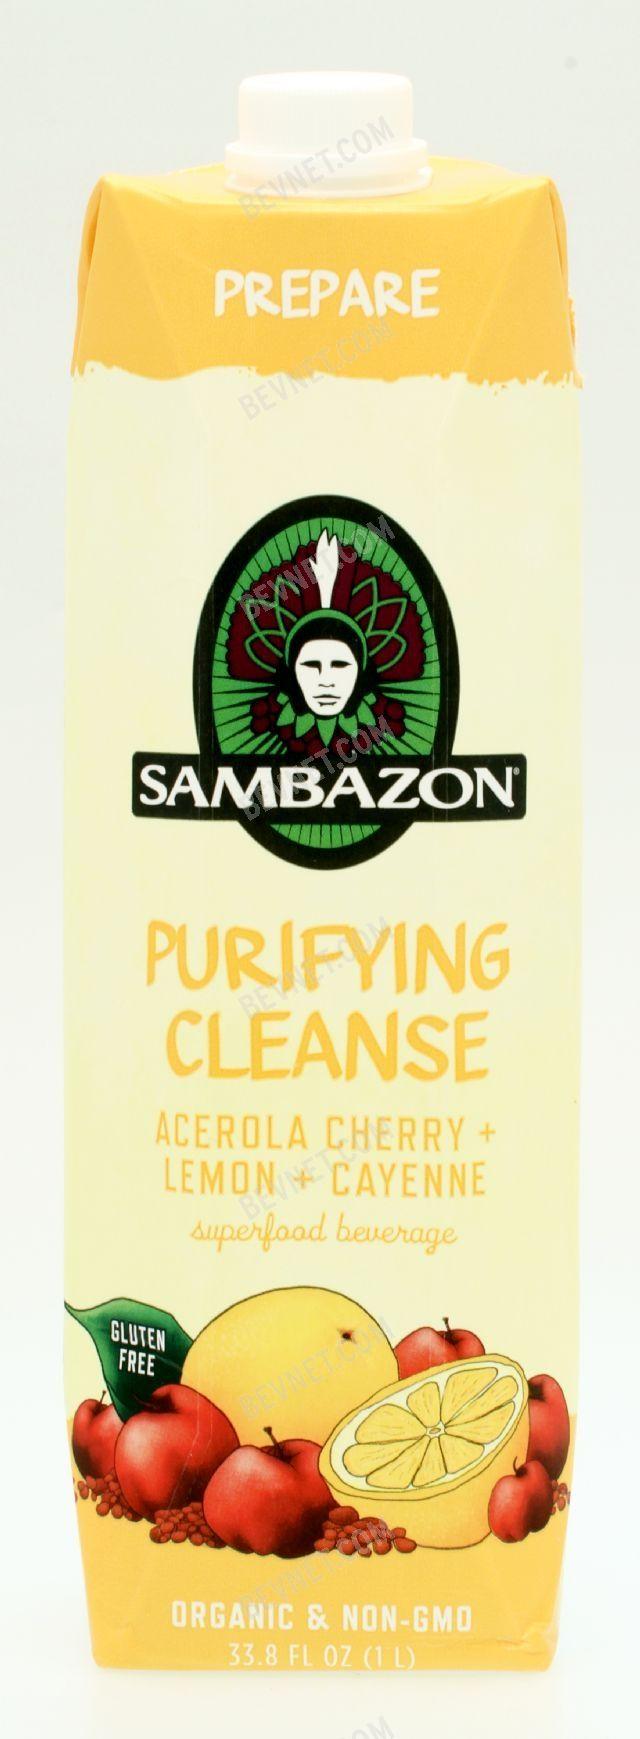 Sambazon: